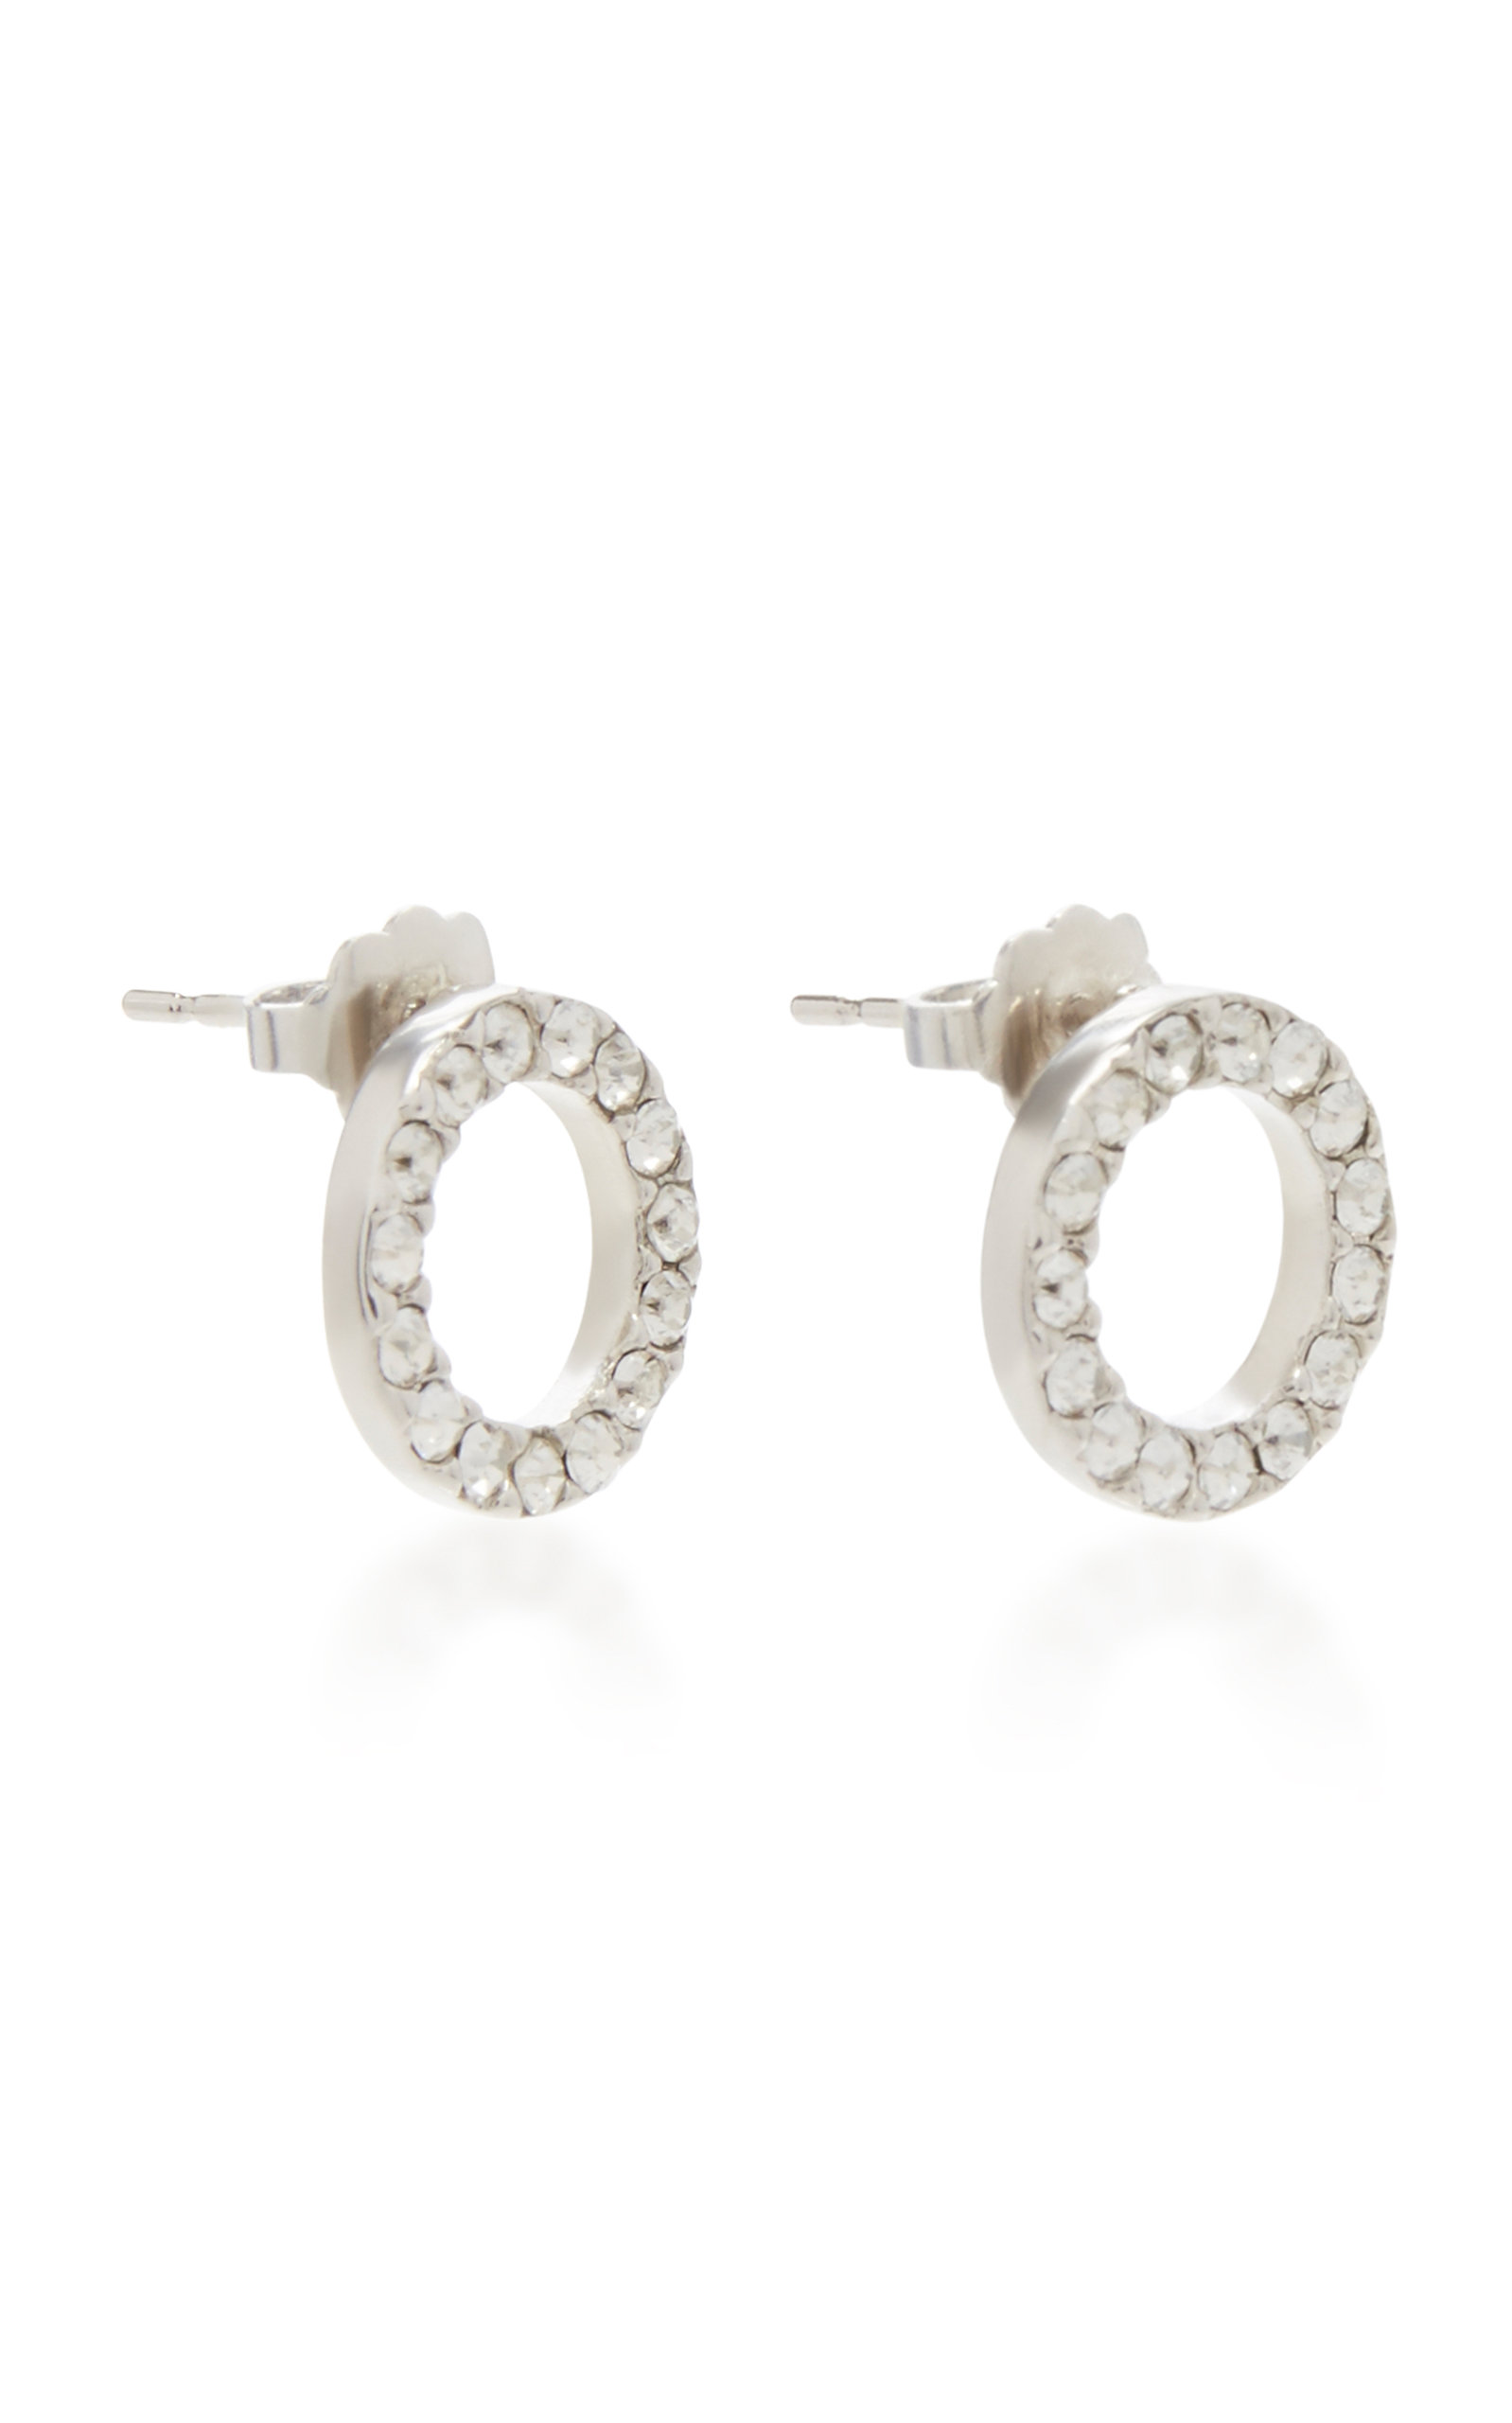 Silver-Plated Swarovski Crystal Earrings Isabel Marant WTN6x